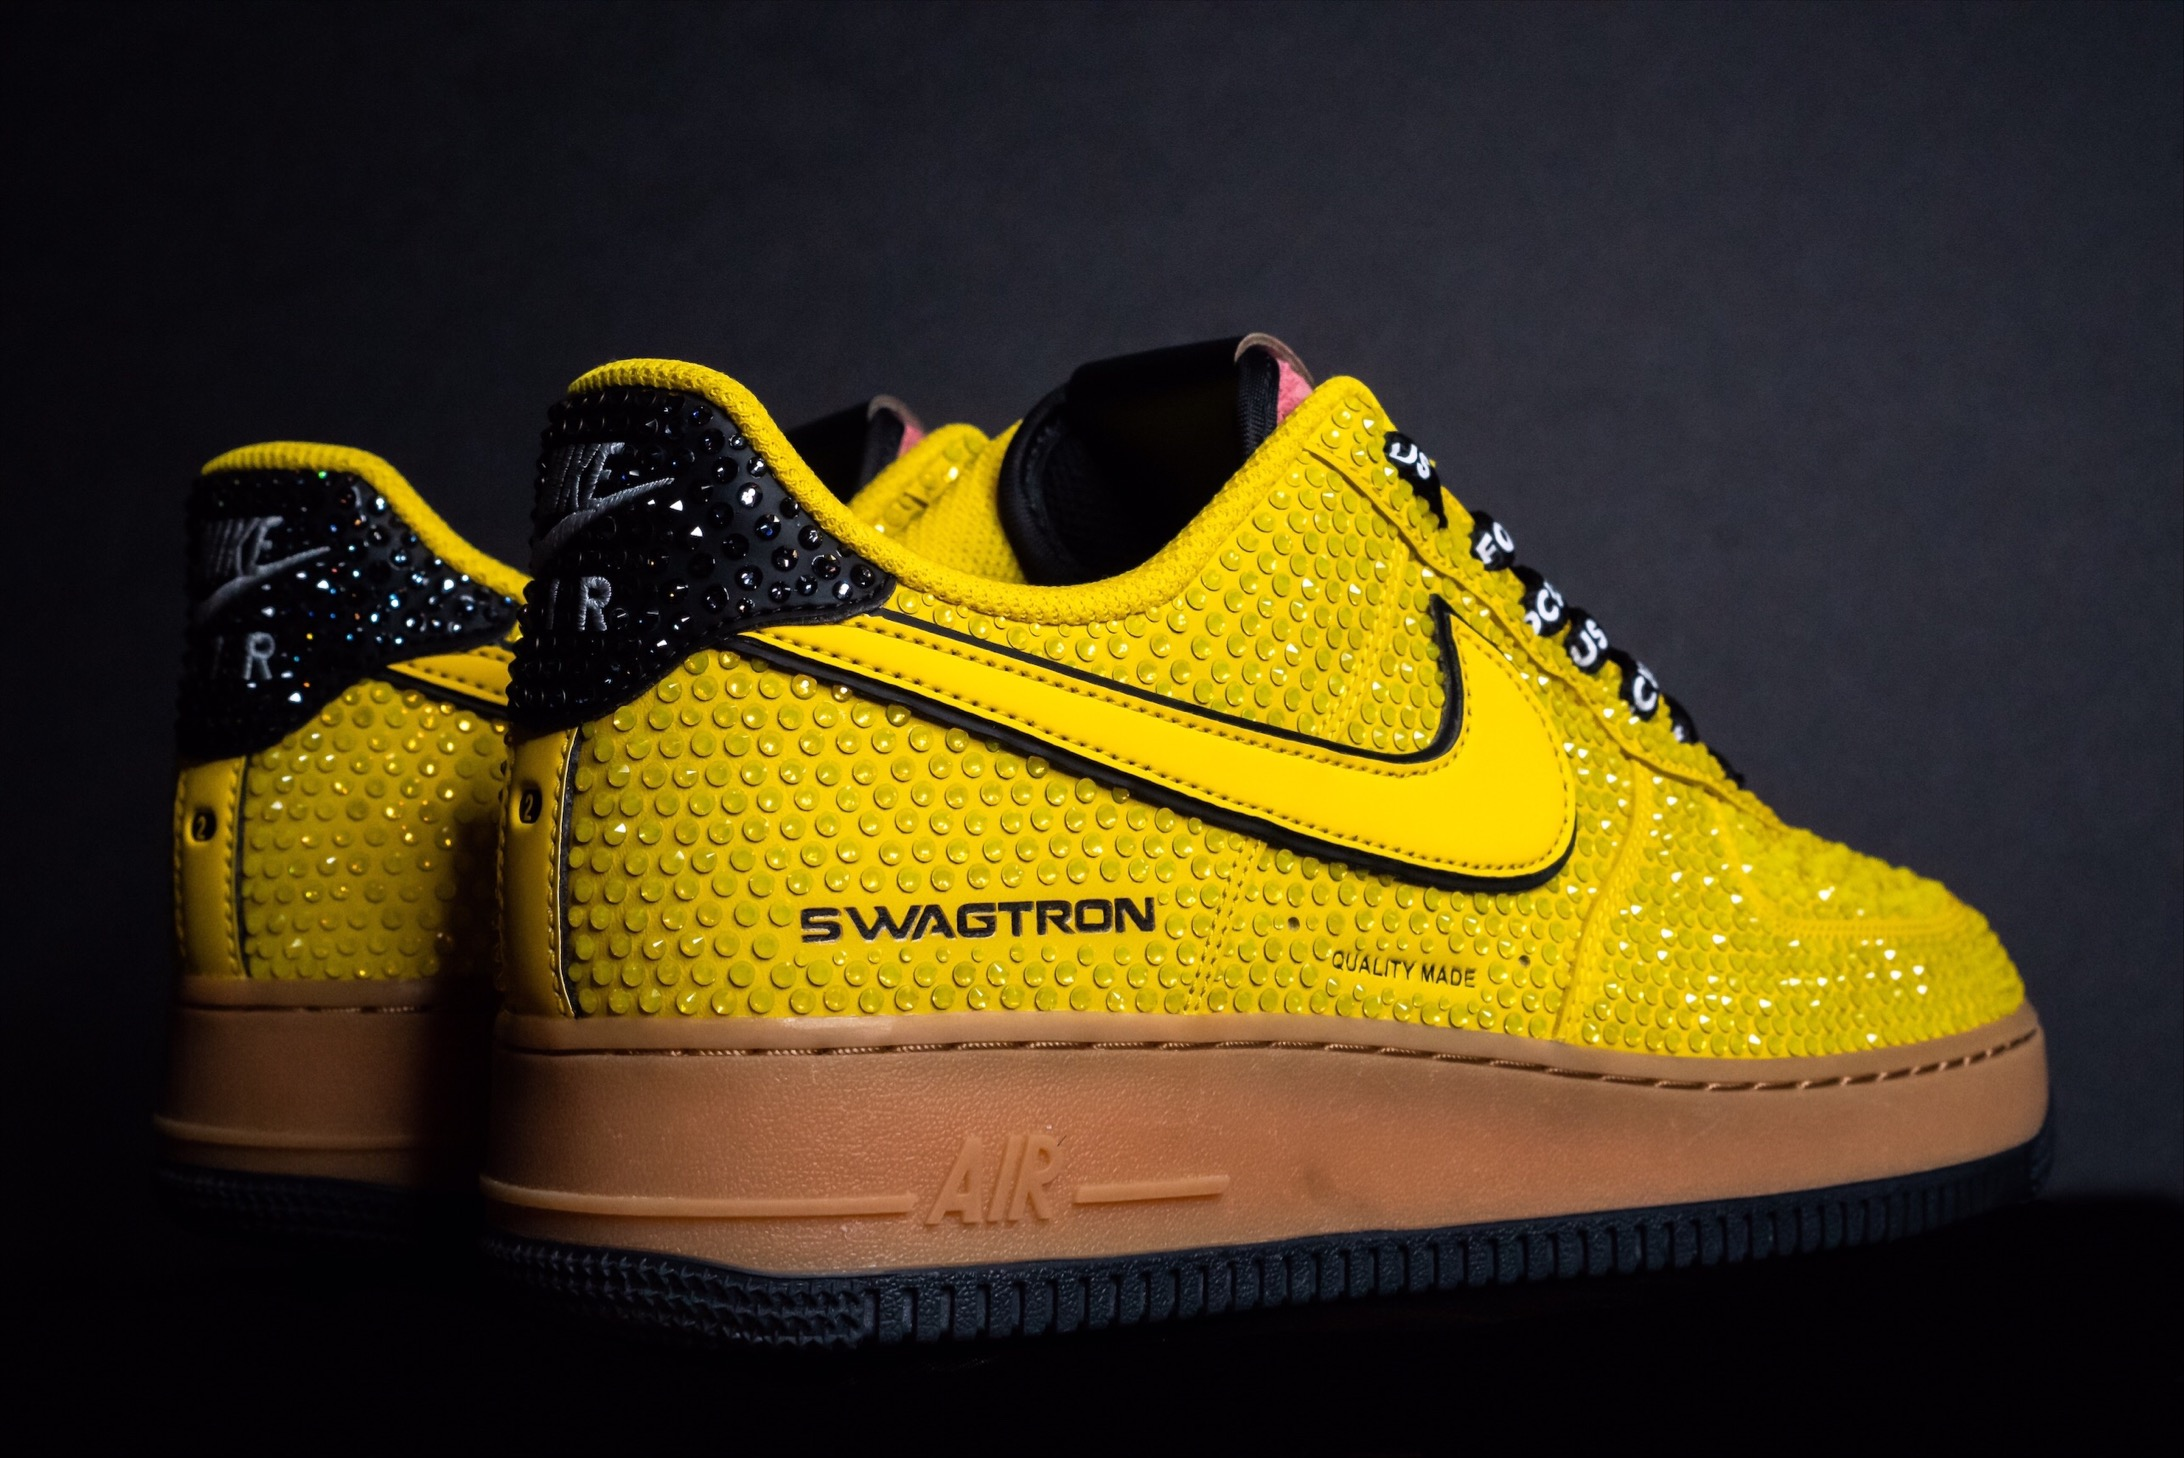 SWAGTRON x GVG Gemified Air Jordans